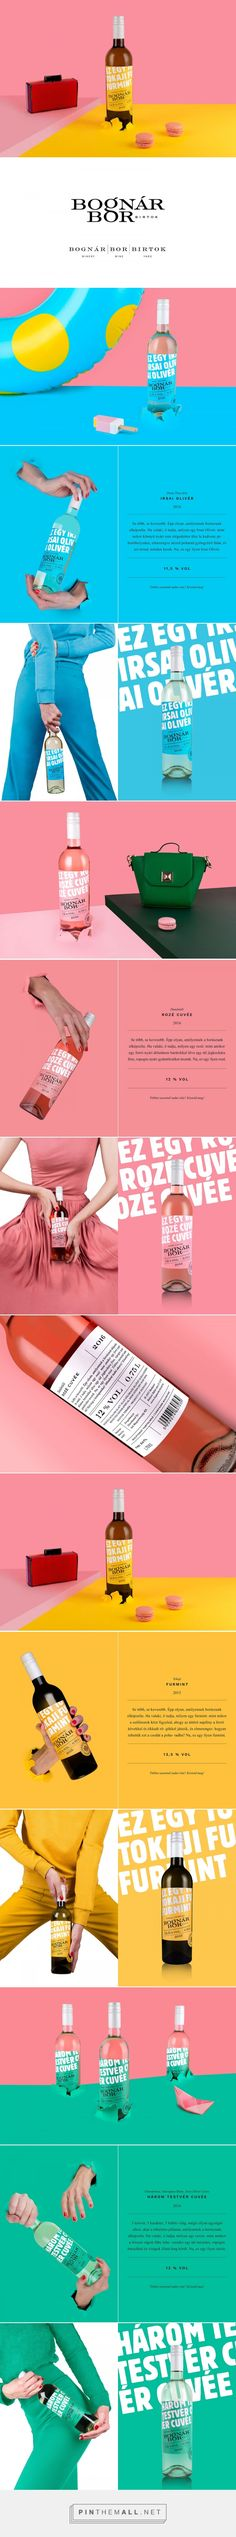 Bognár Bor Birtok wine packaging design by Kissmiklos - http://www.packagingoftheworld.com/2017/09/bognar-bor-birtok.html